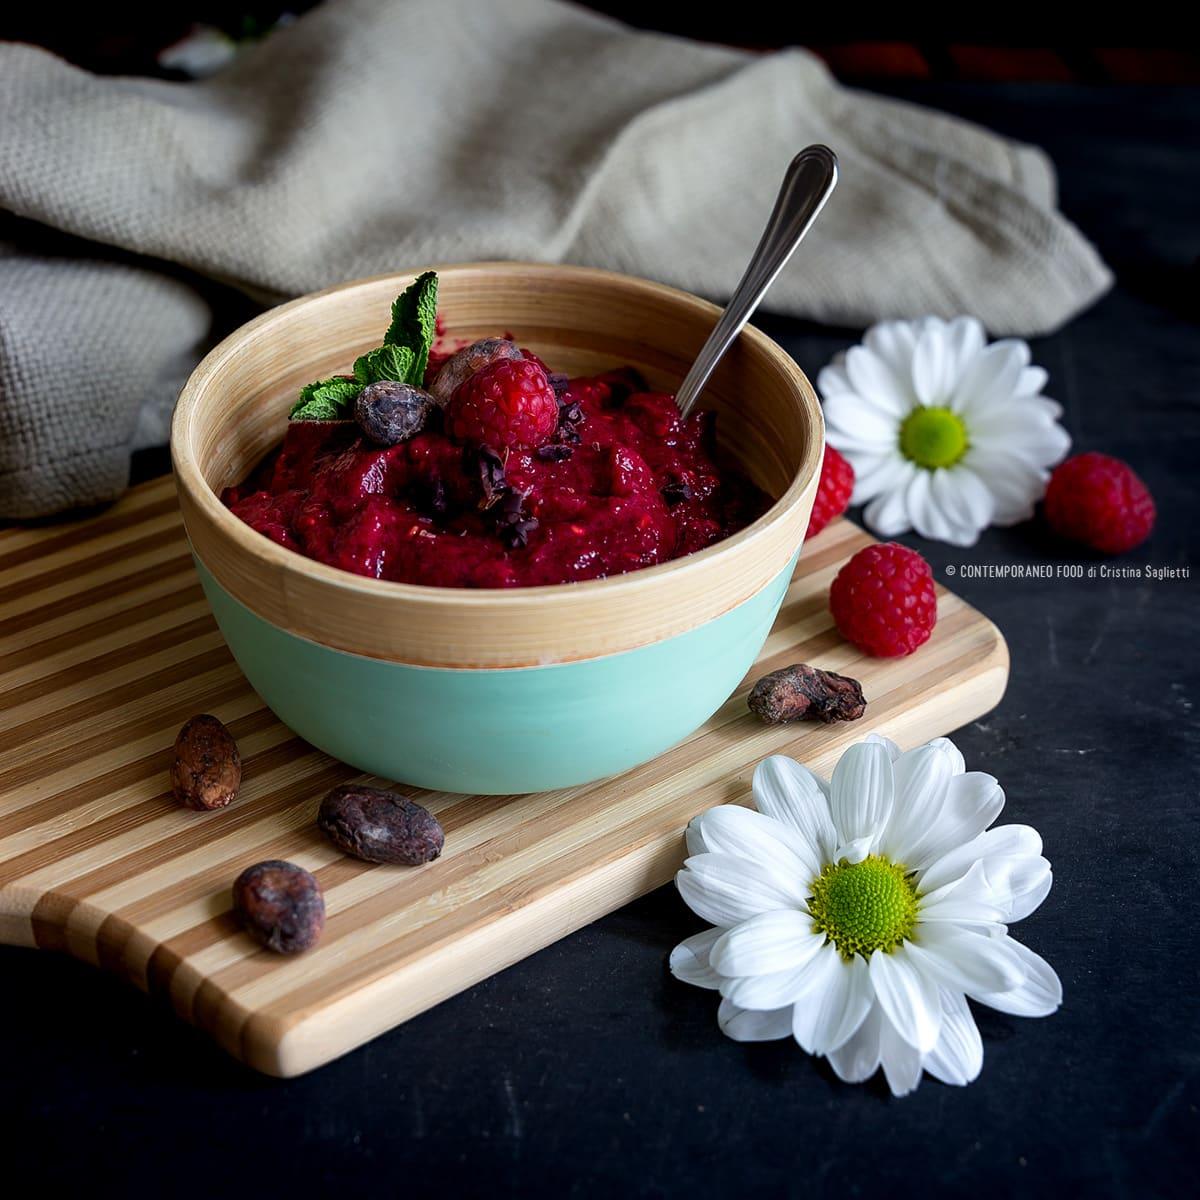 green-smoothie-bowl-barbabietola-lamponi-fave-di-cacao-dieta-ricetta-light-facile-ricetta-light-contemporaneo-food